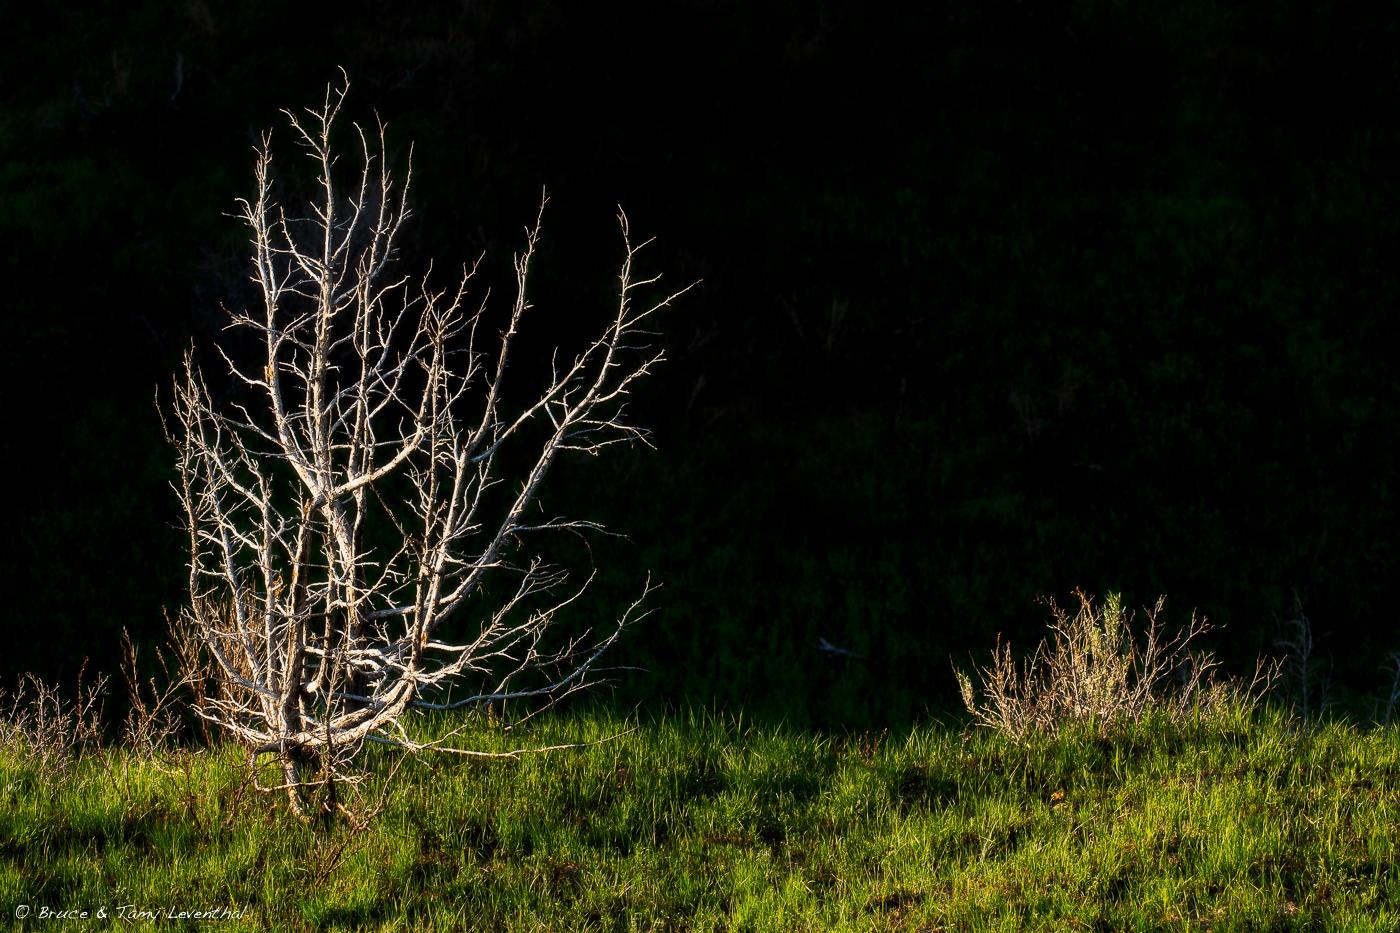 TreeBones_LEV4962-Edit.jpg